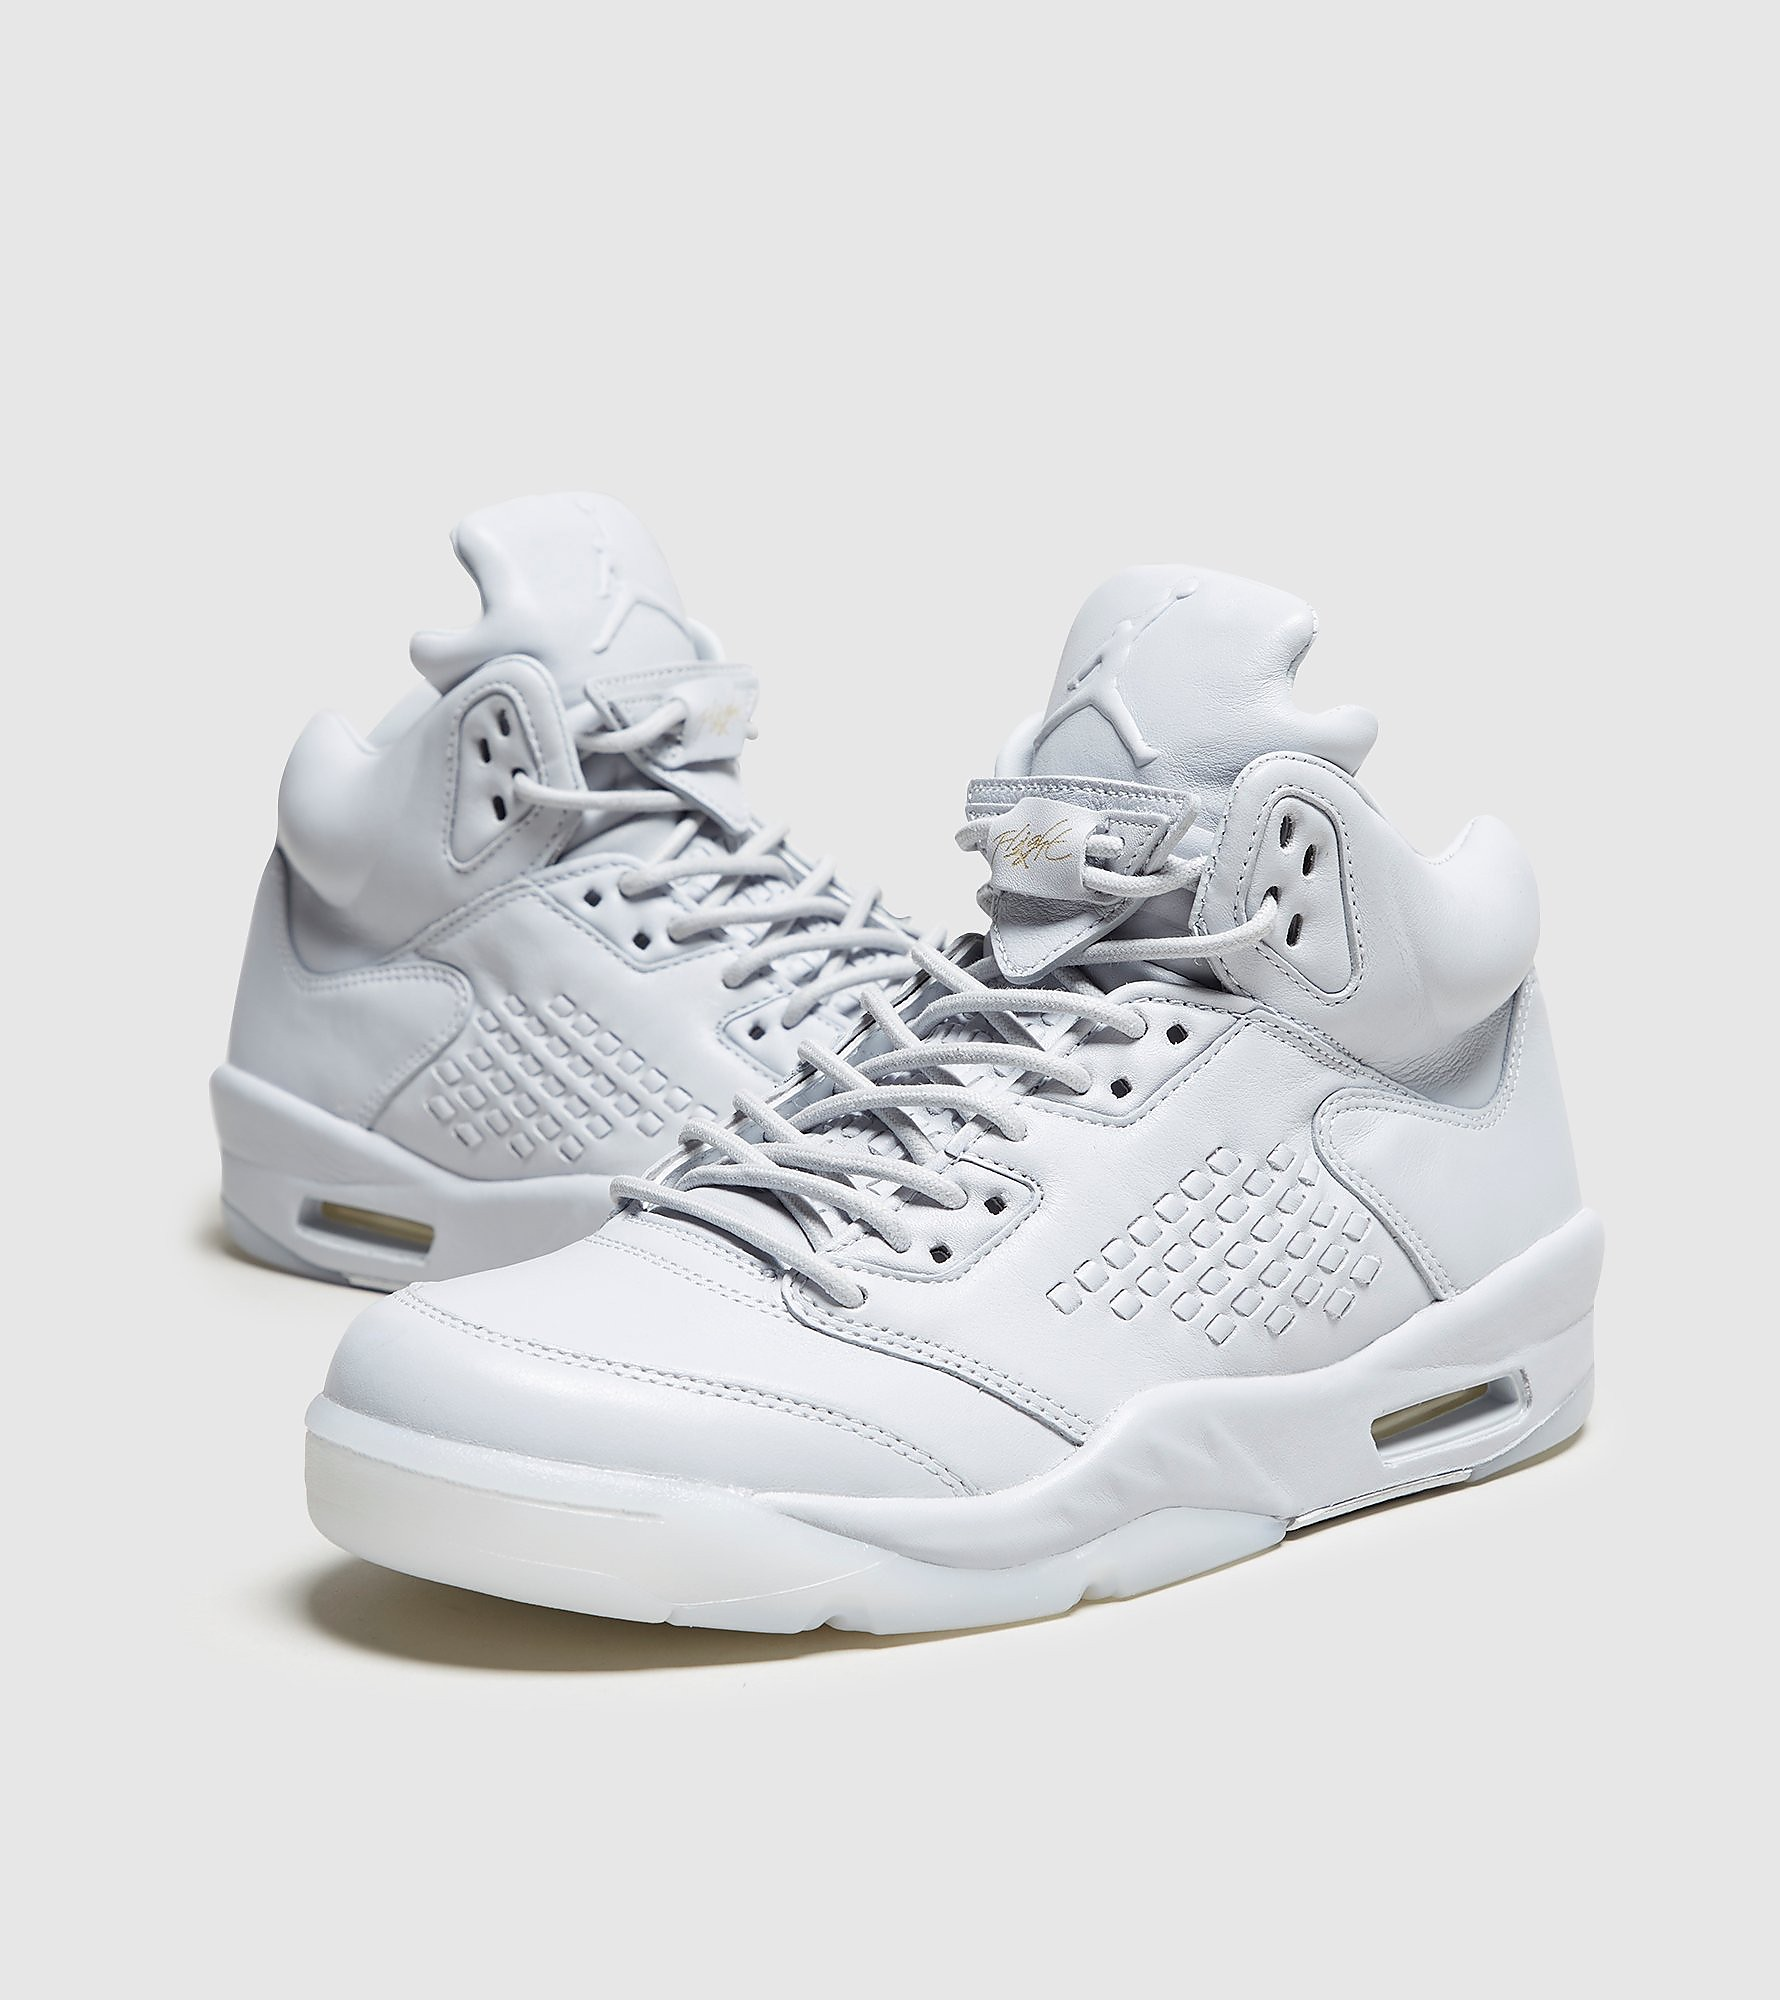 Jordan 5 Pure Platinum